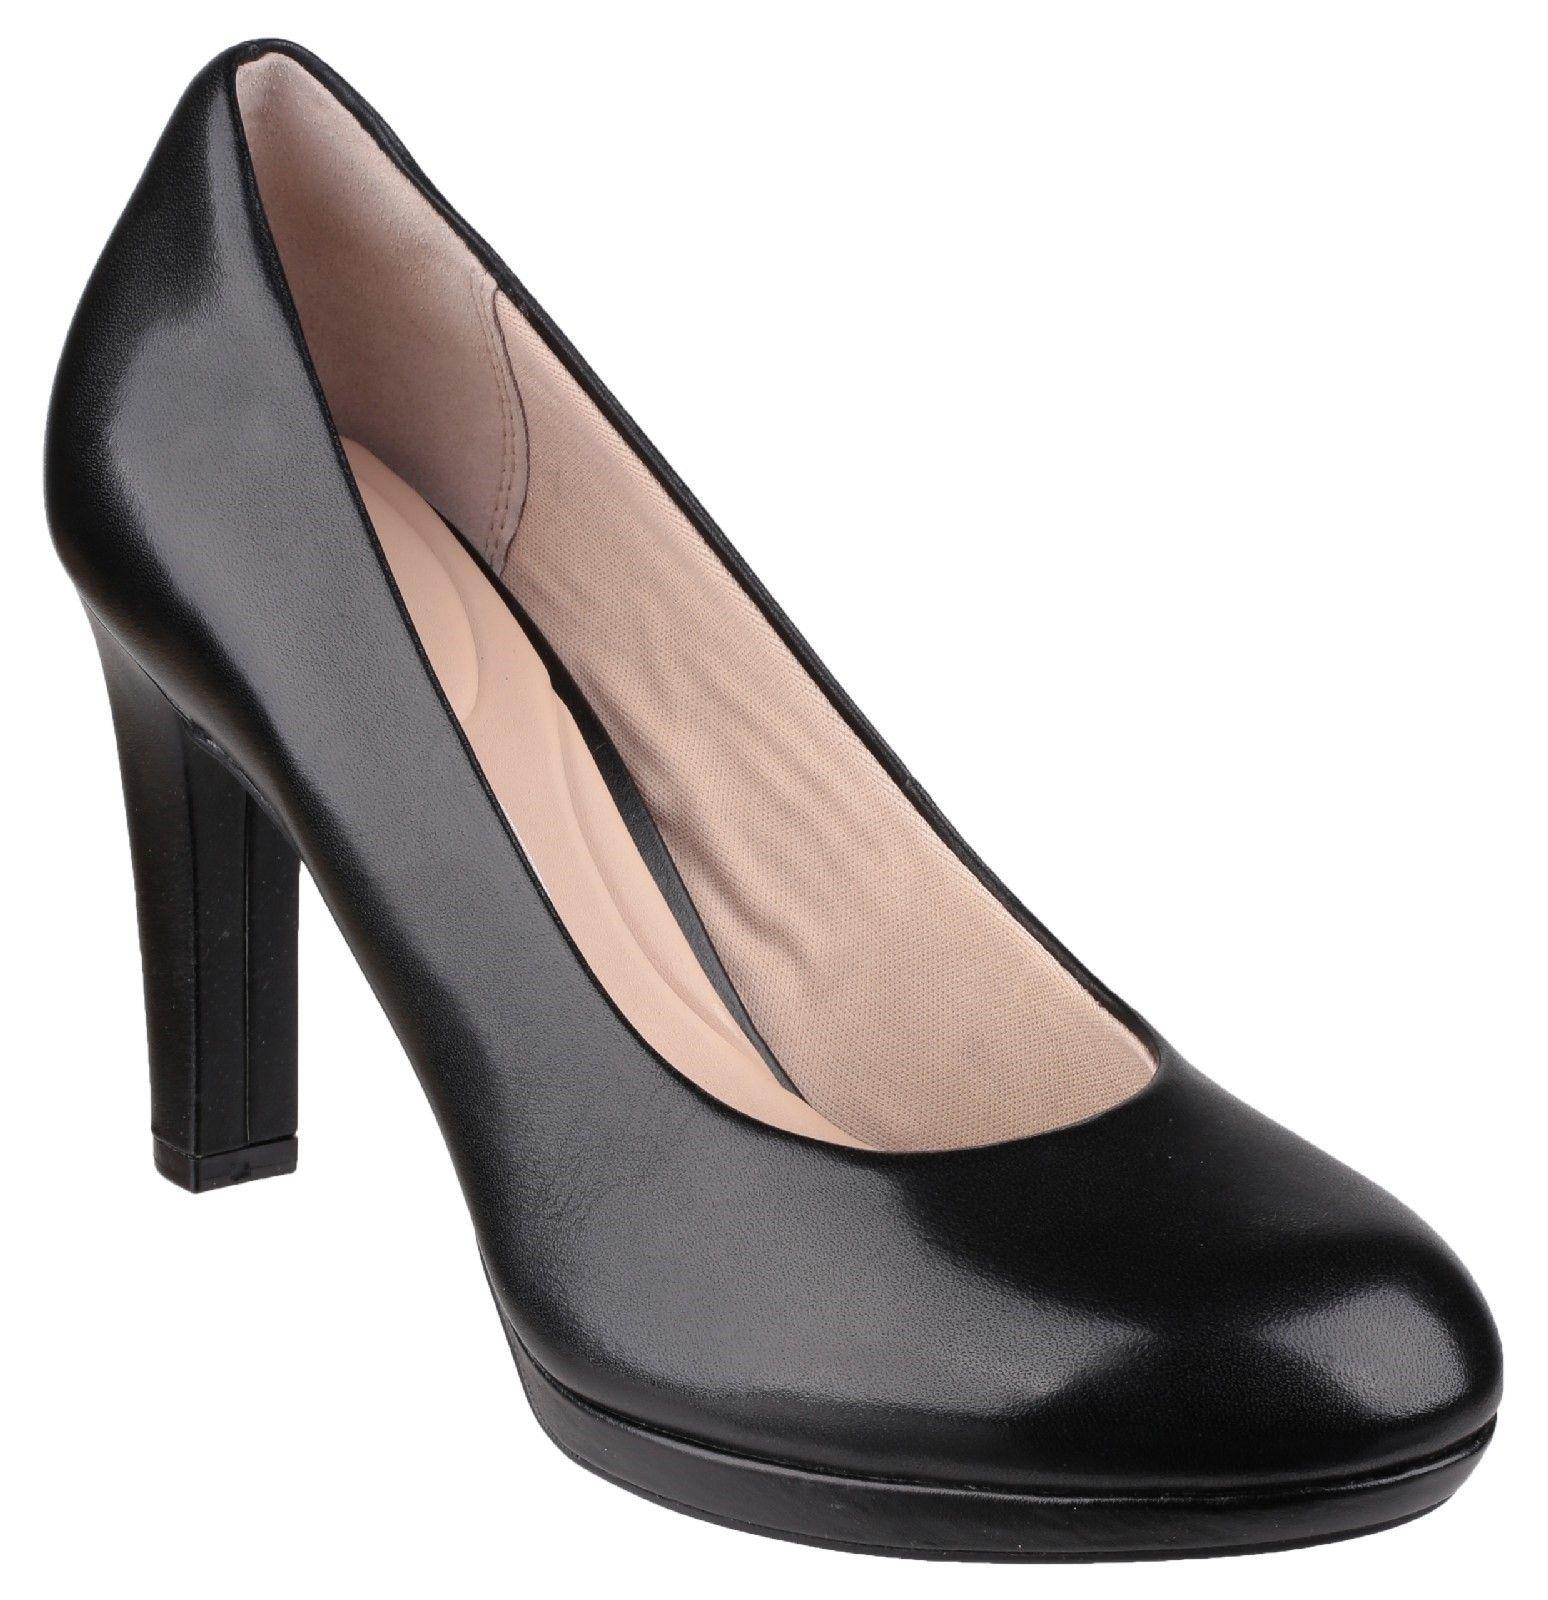 Seven To 7 Black Court Shoe